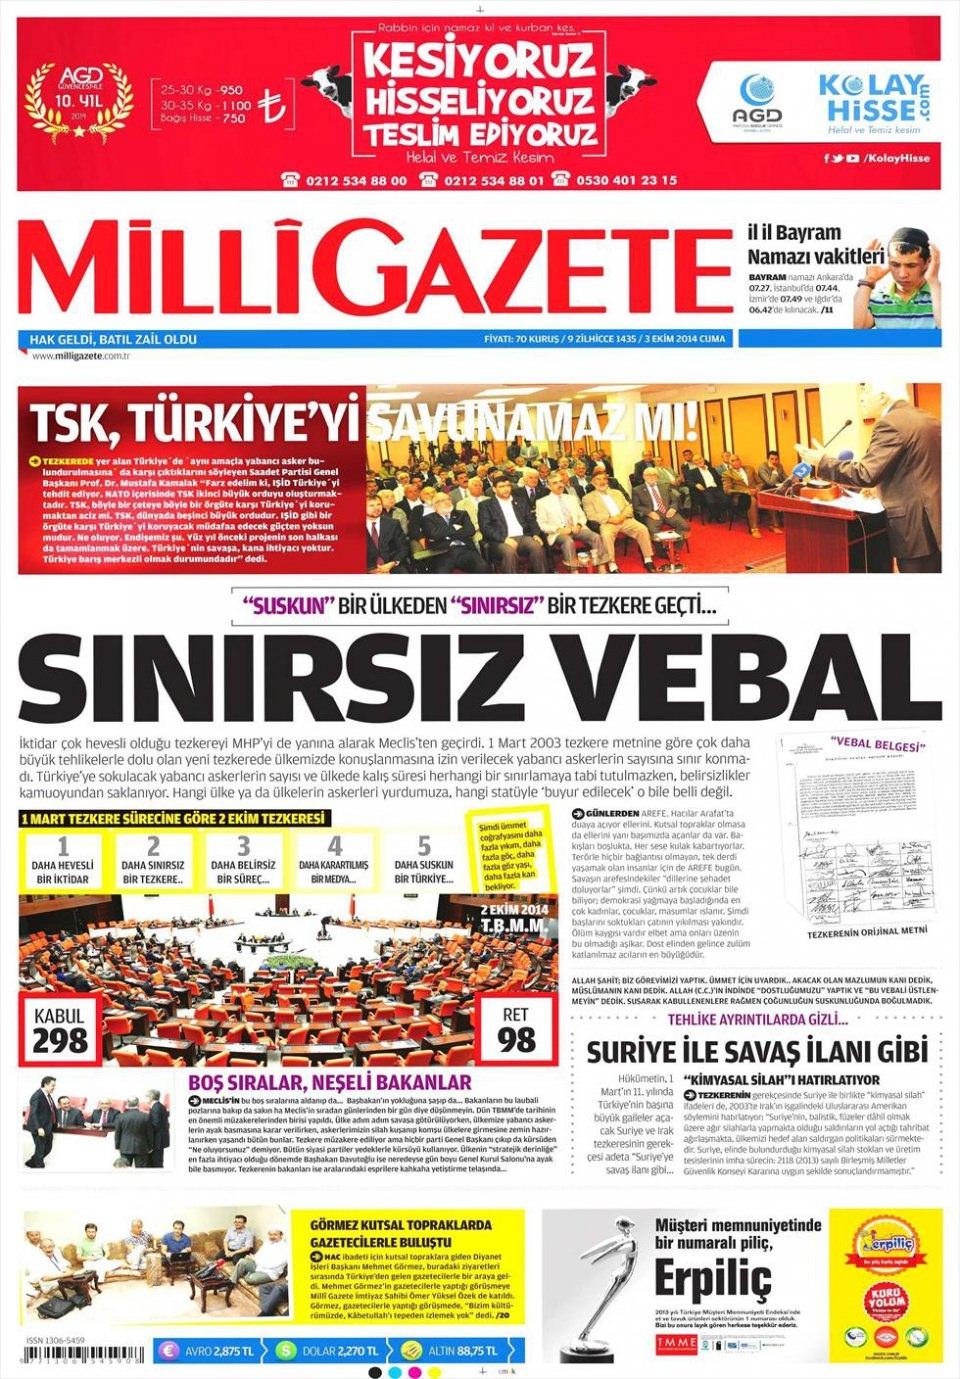 3 Ekim 2014 gazete manşetleri 11